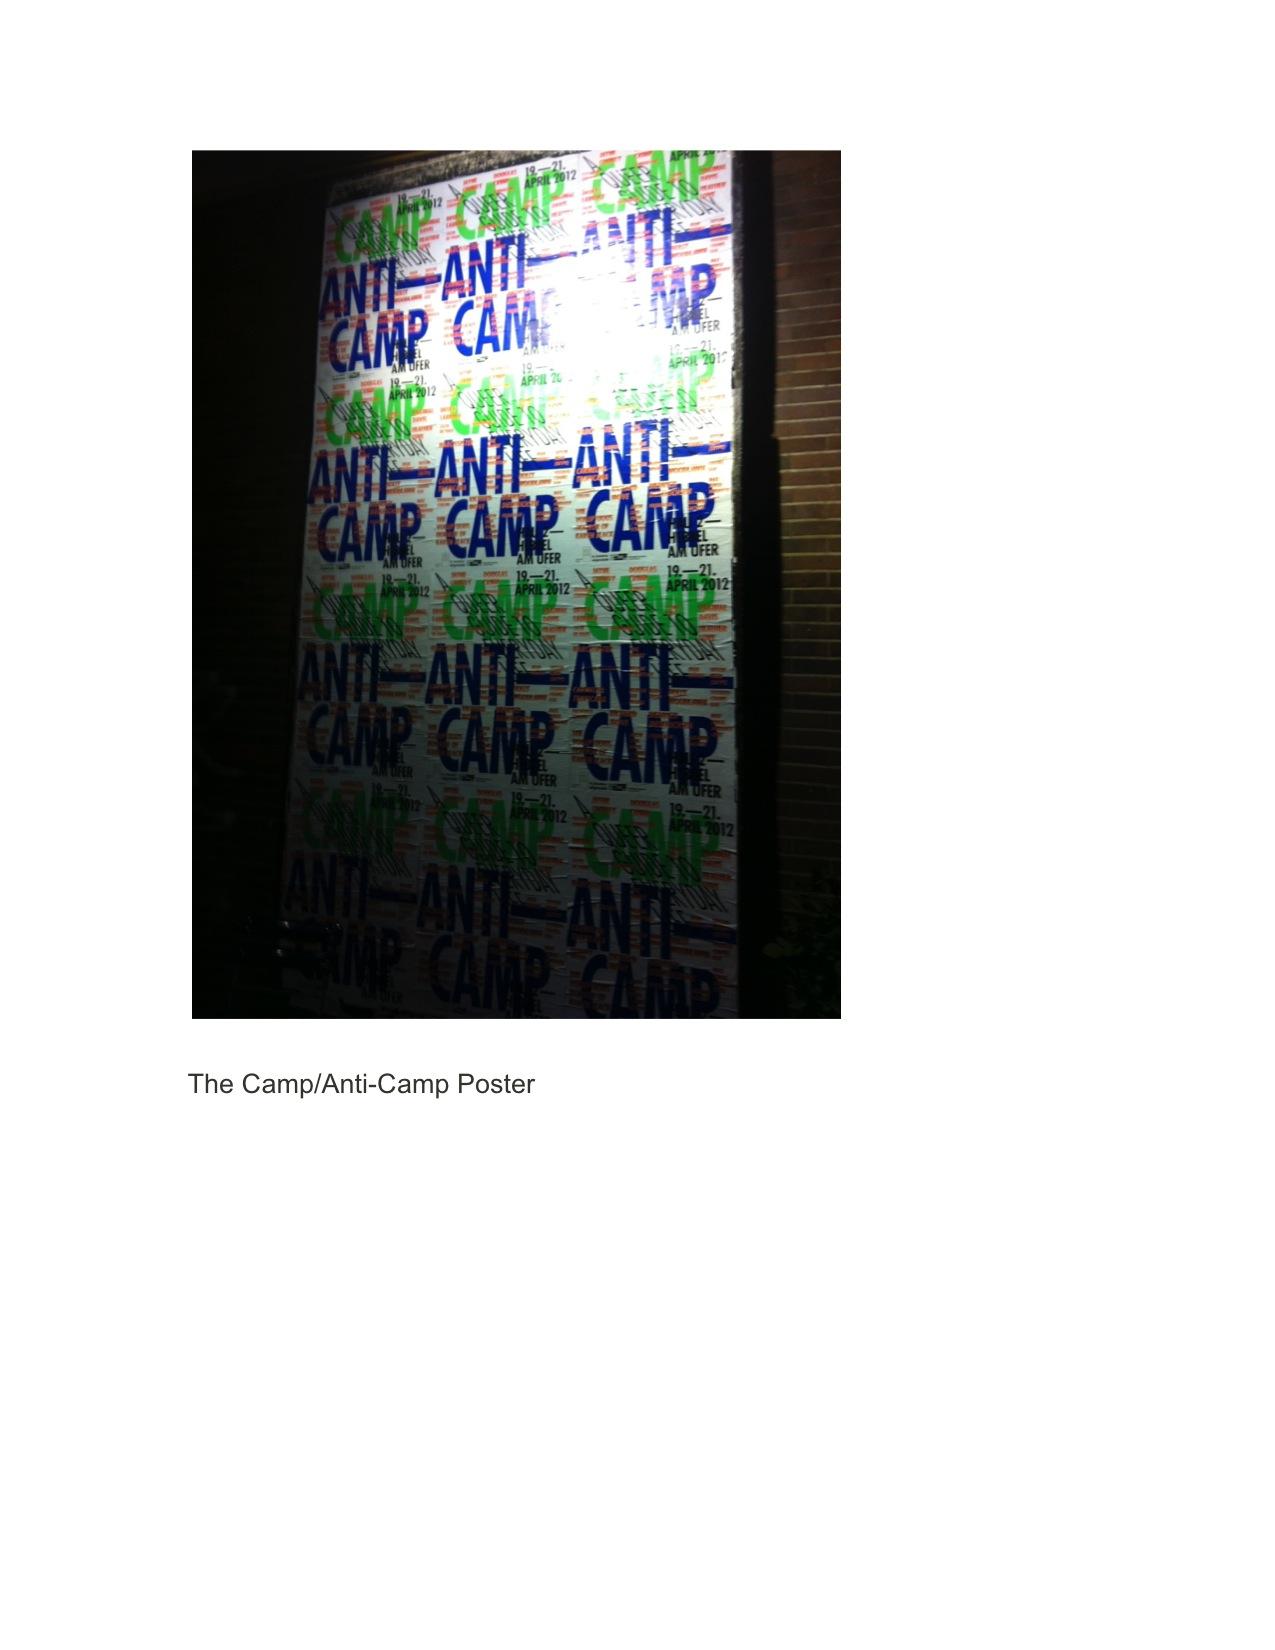 2012_Vice_LaBruce 4 copy.jpg